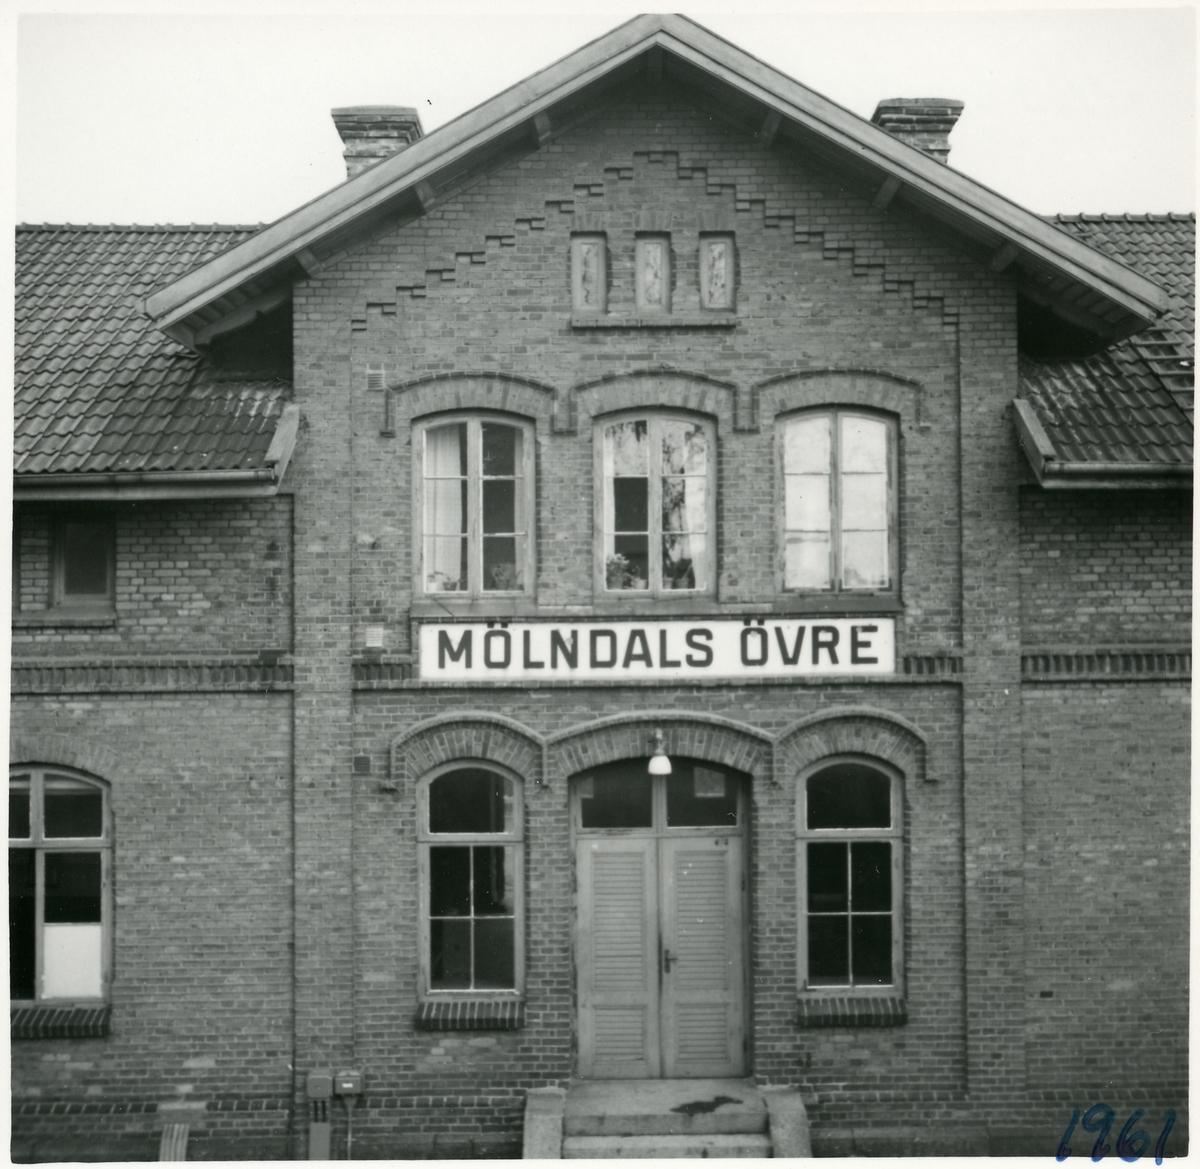 Mölndals övre stationshus